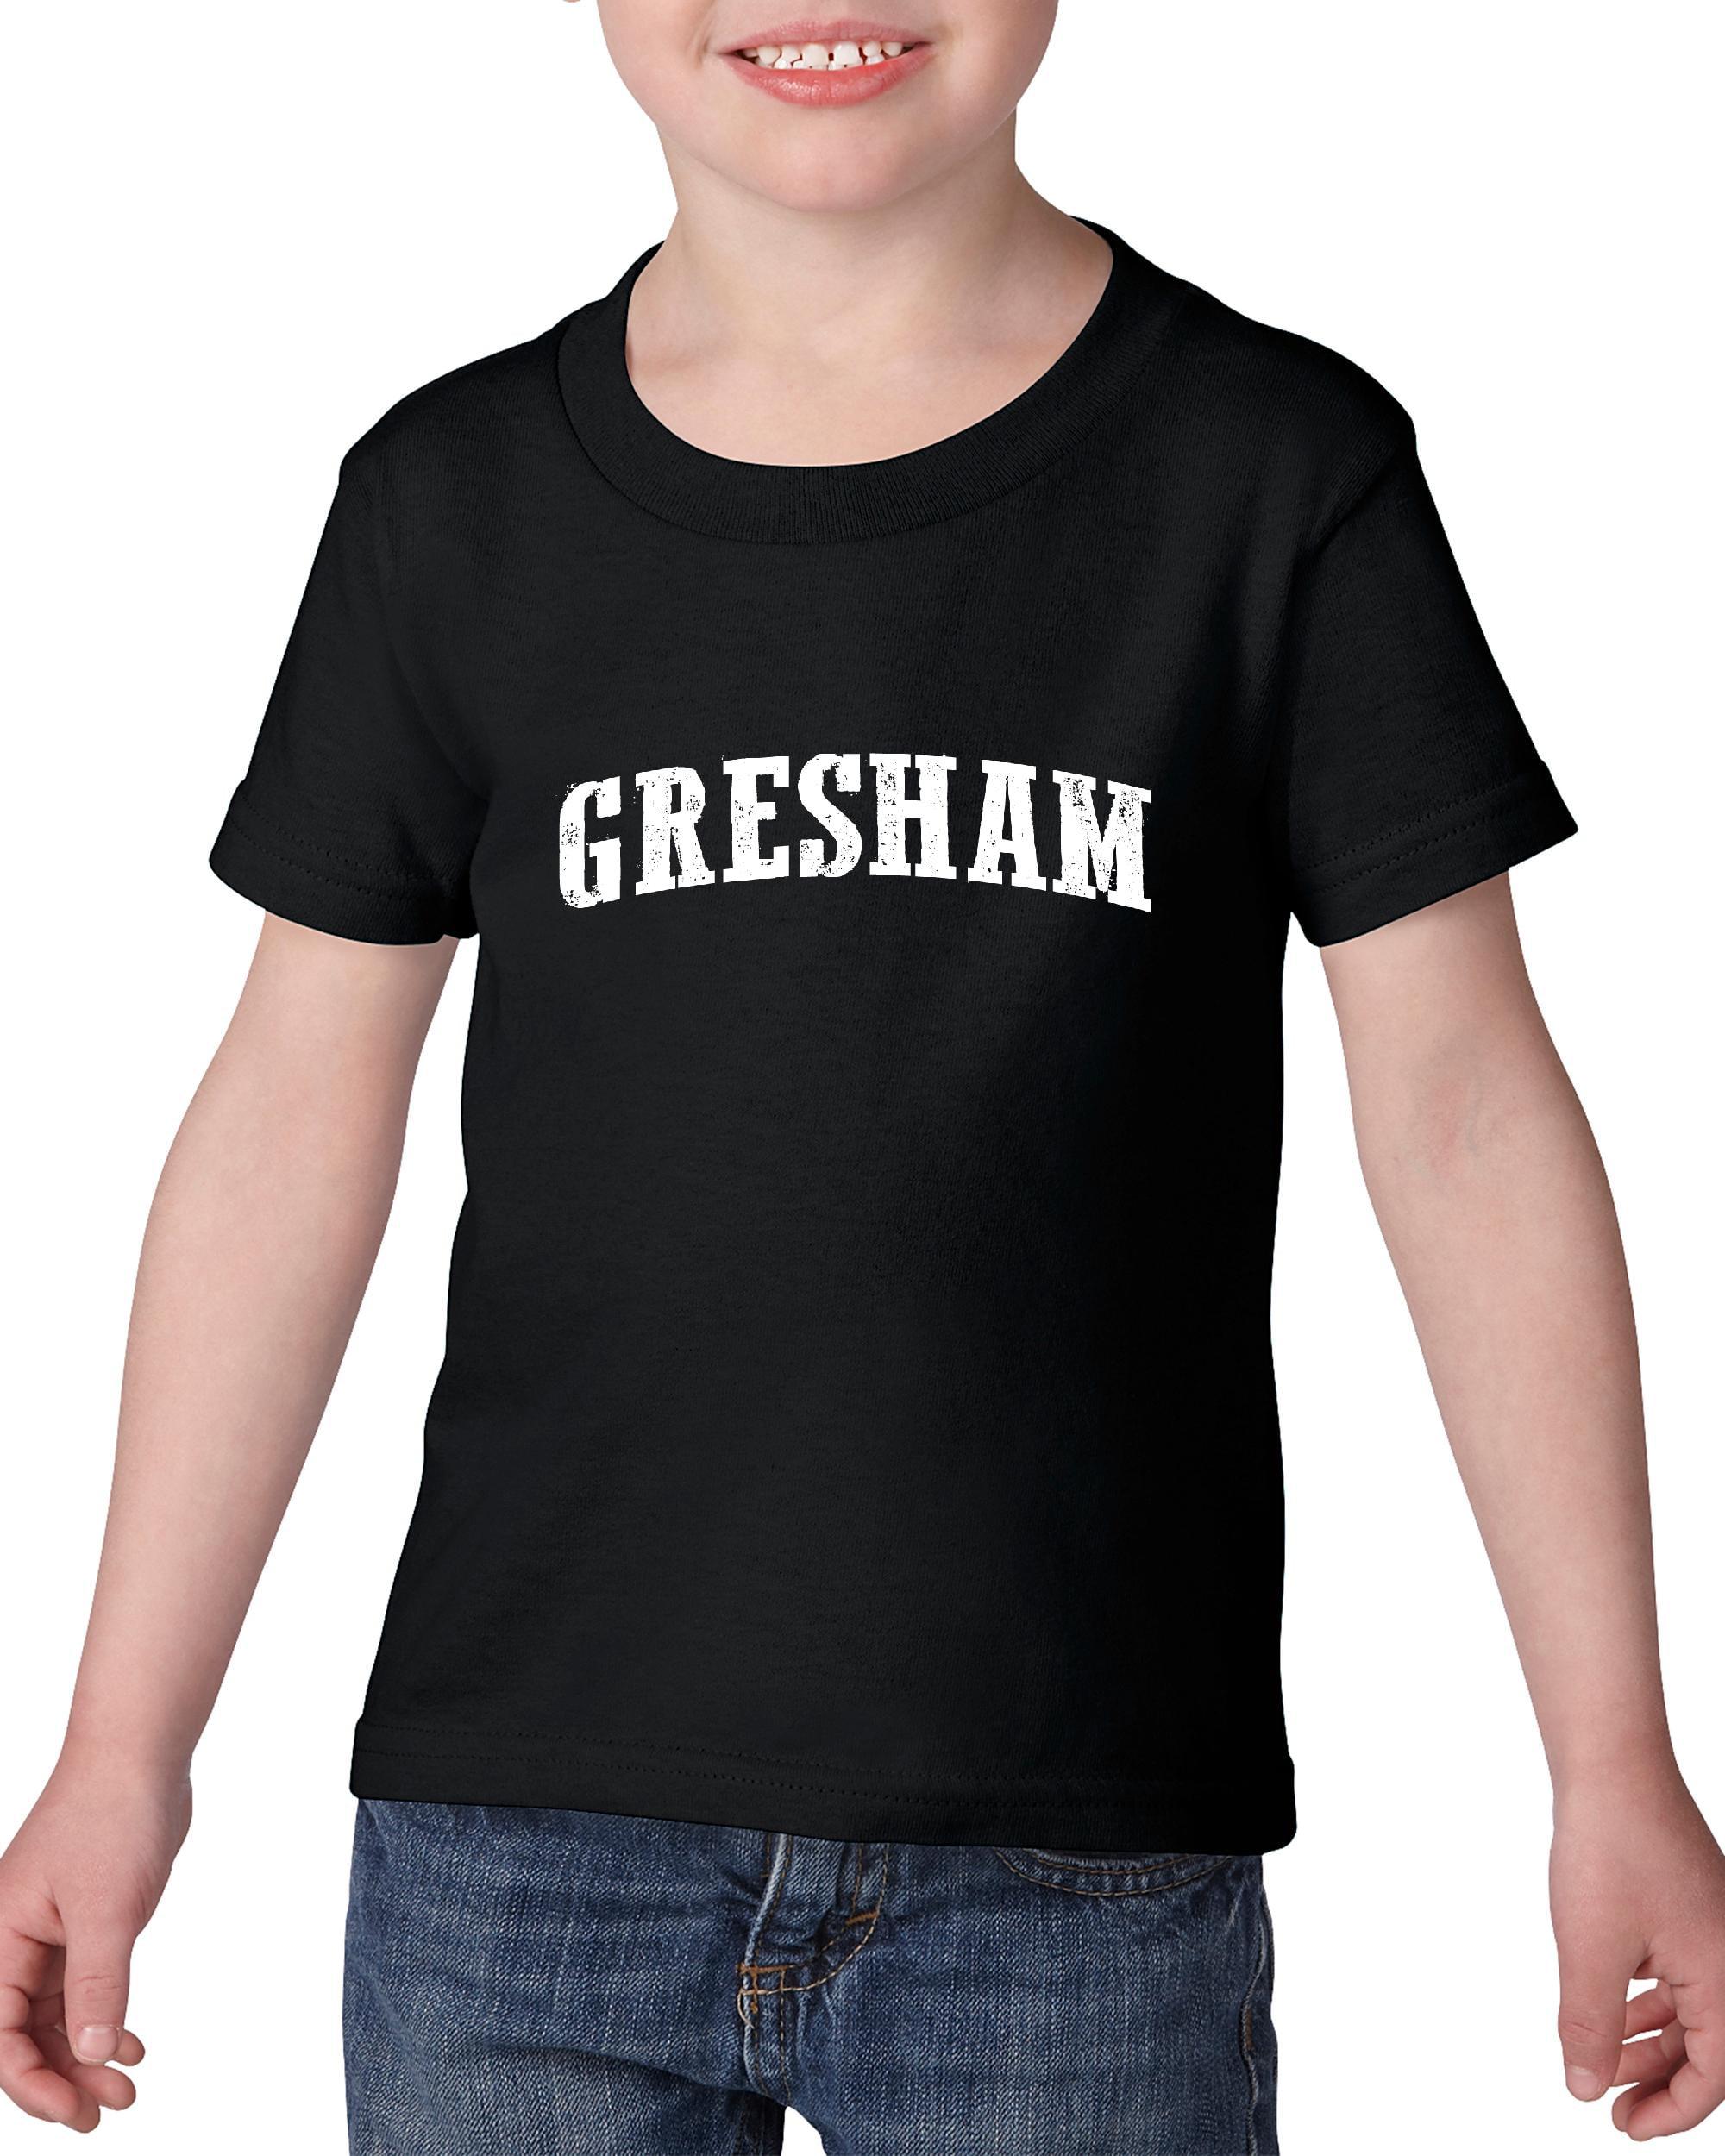 Artix Gresham OR Oregon Flag Portland Map Beavers Home of Oregon State University Heavy Cotton Toddler Kids T-Shirt Tee Clothing